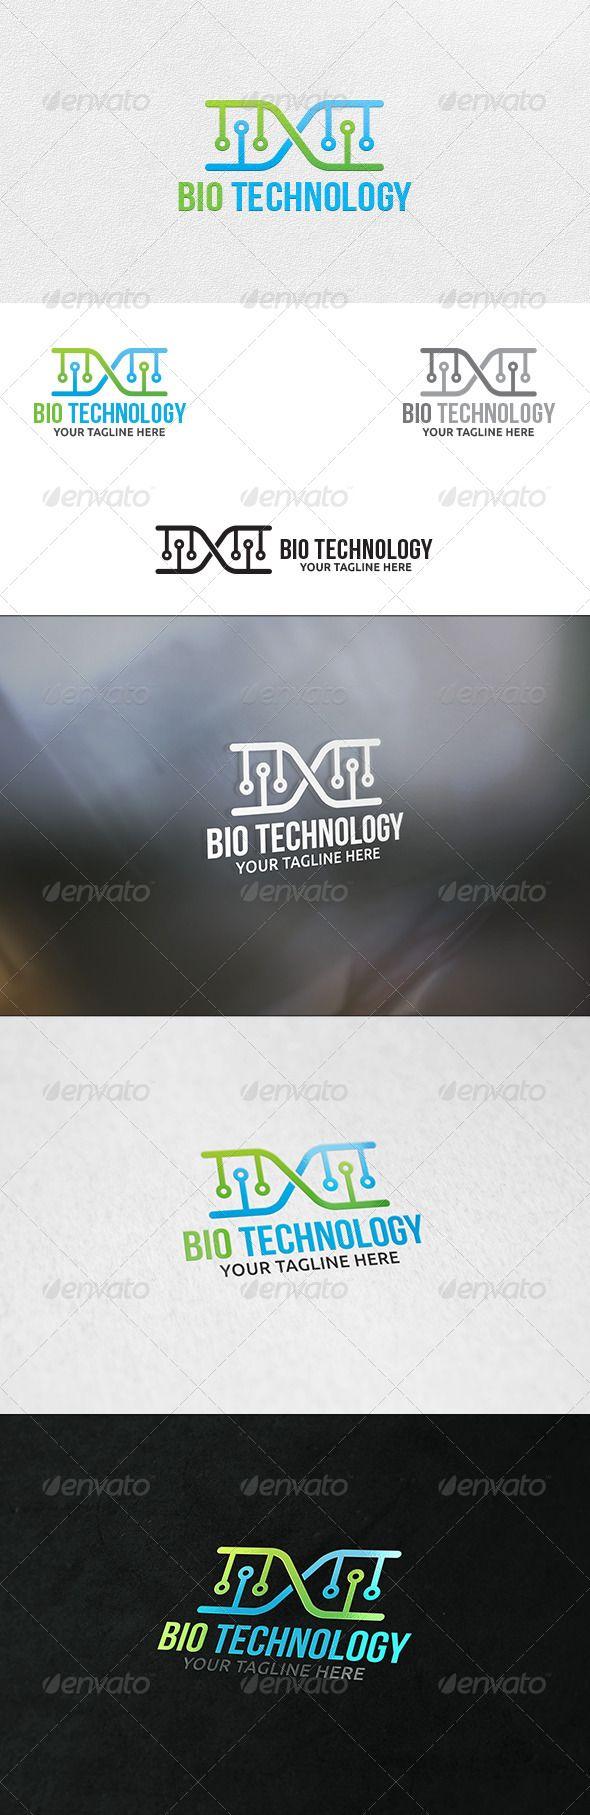 Bio Technology - Logo Template